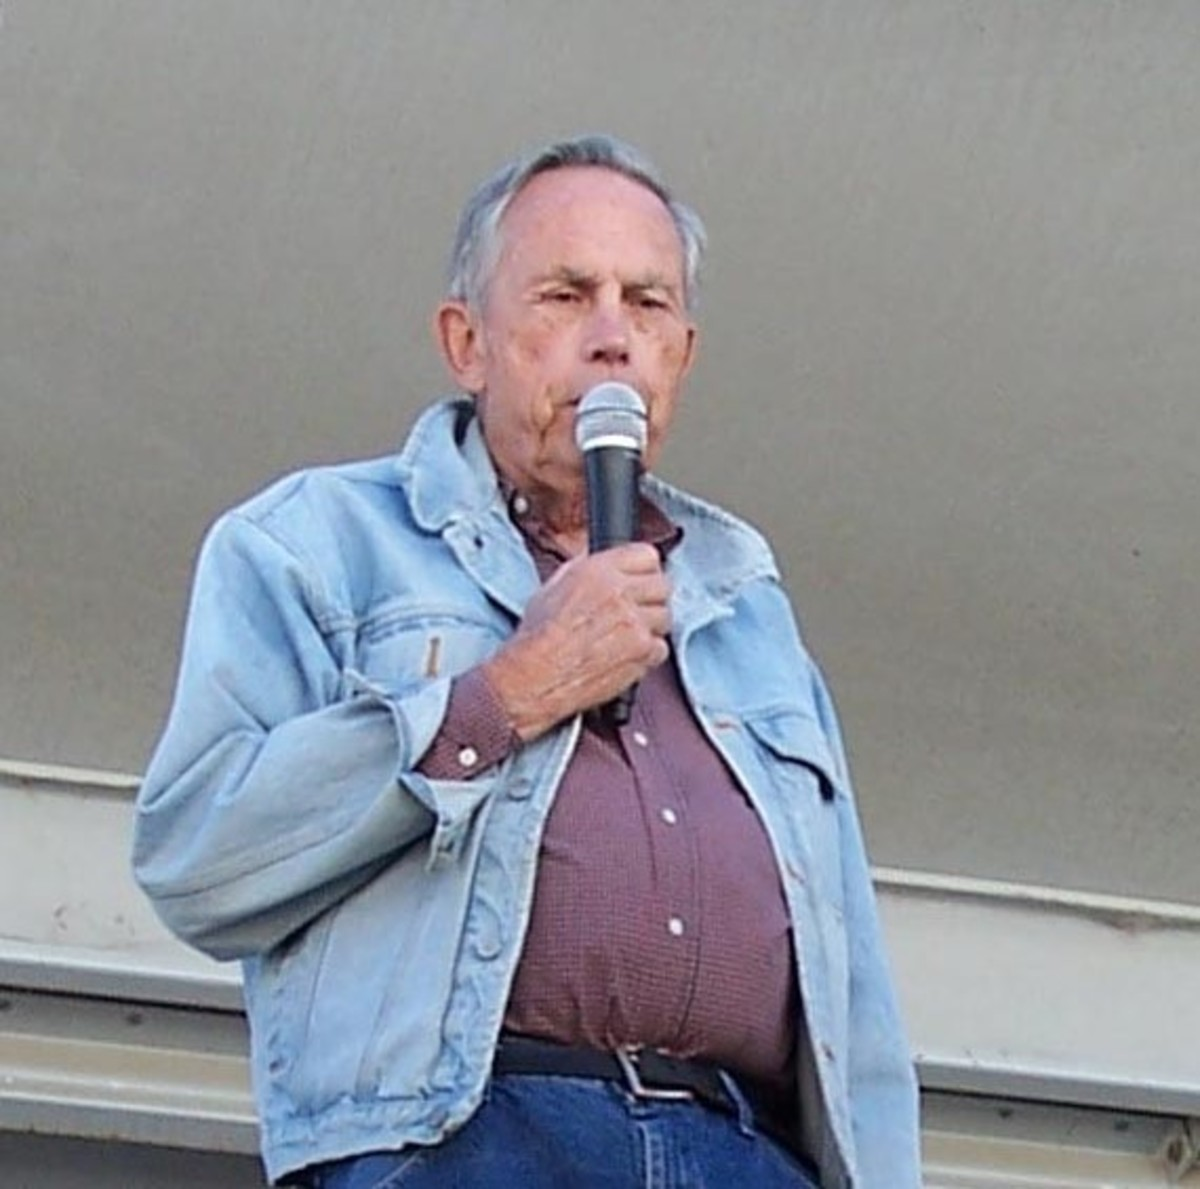 Bill Mero, speaking on the history of John Marsh and his landholdings